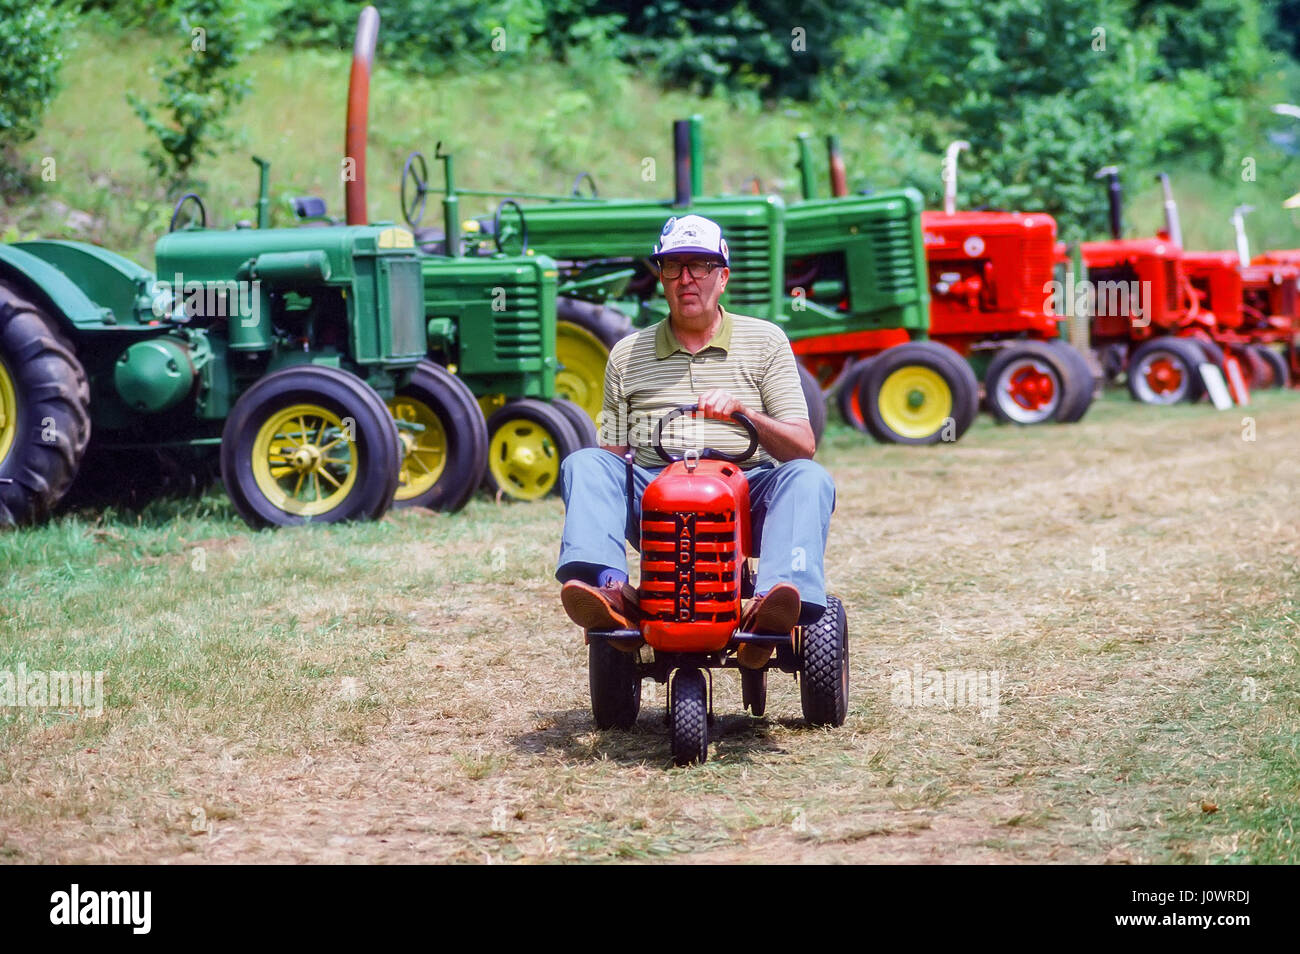 Guy On Tractor : Men driving tractors stock photos